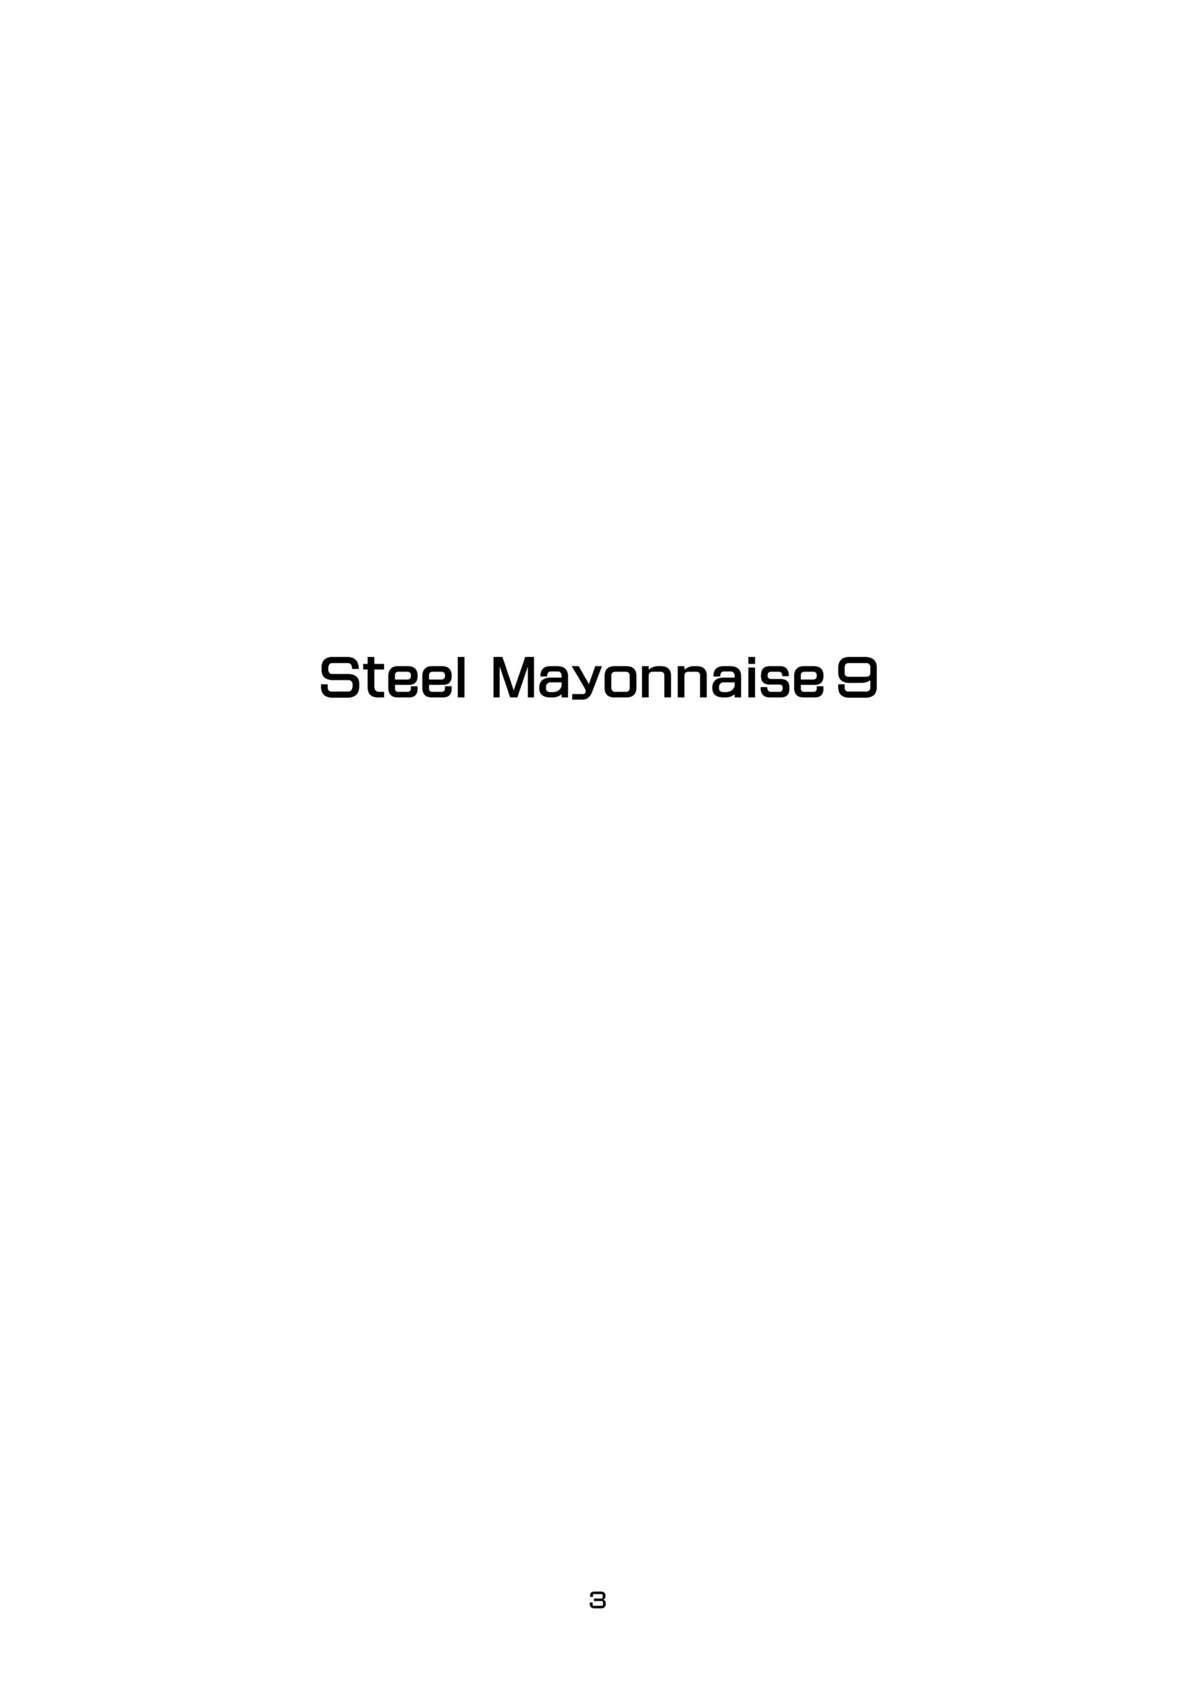 Steel Mayonnaise 9 1